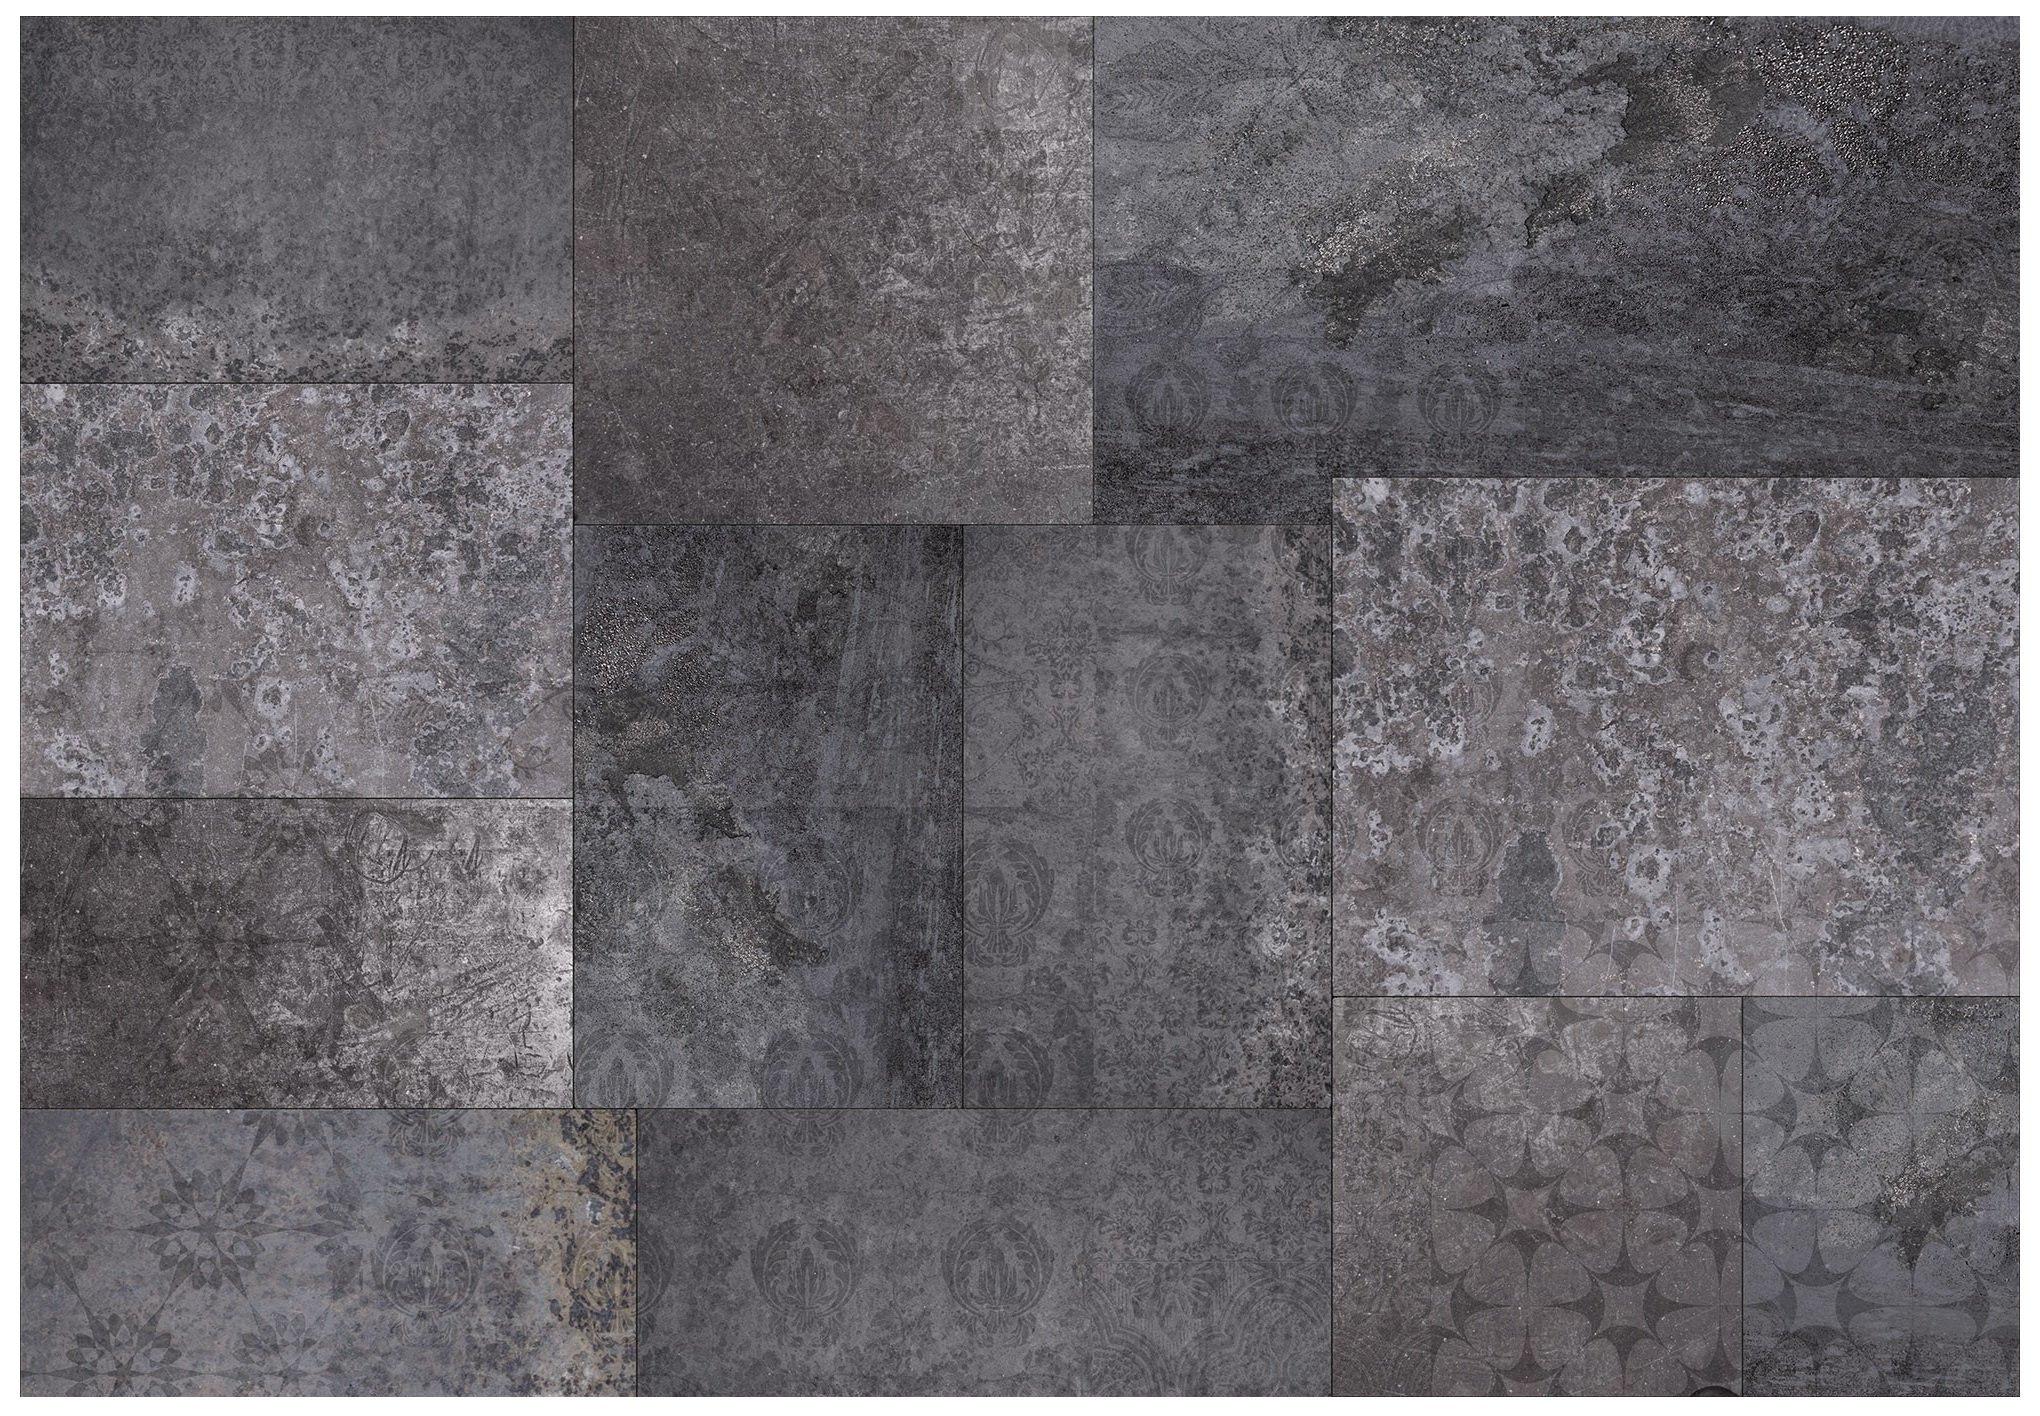 Fototapeta beton szary mur fototapety